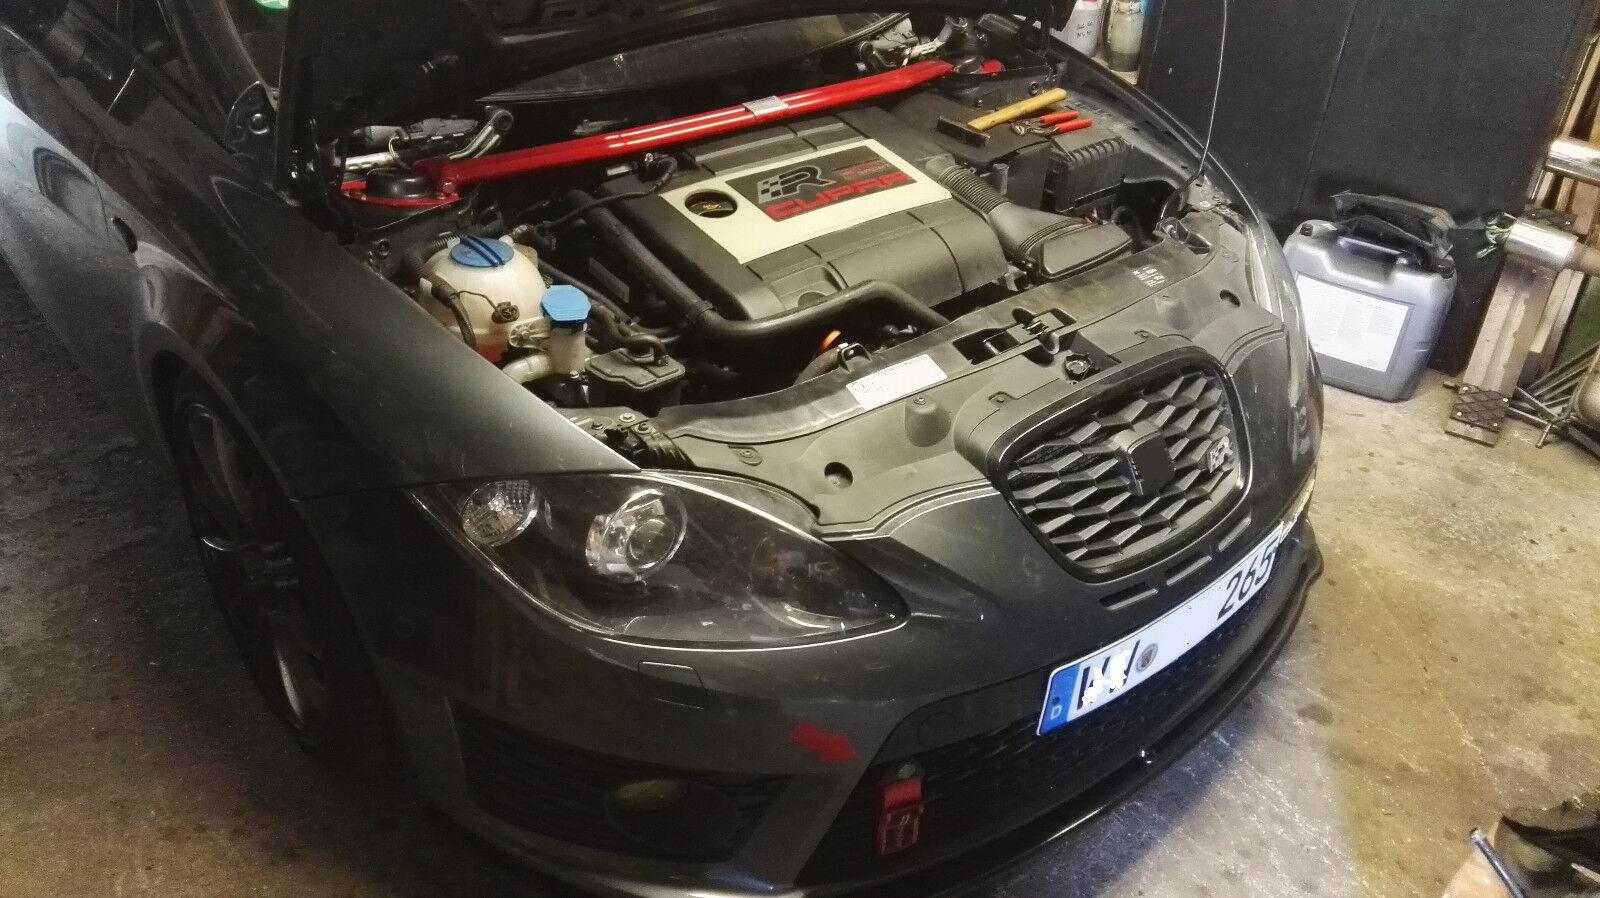 Auspuff GIANNELLI GO Sport Peugeot liegend AC luftgekühlt LC 50 2T wassergekühlt